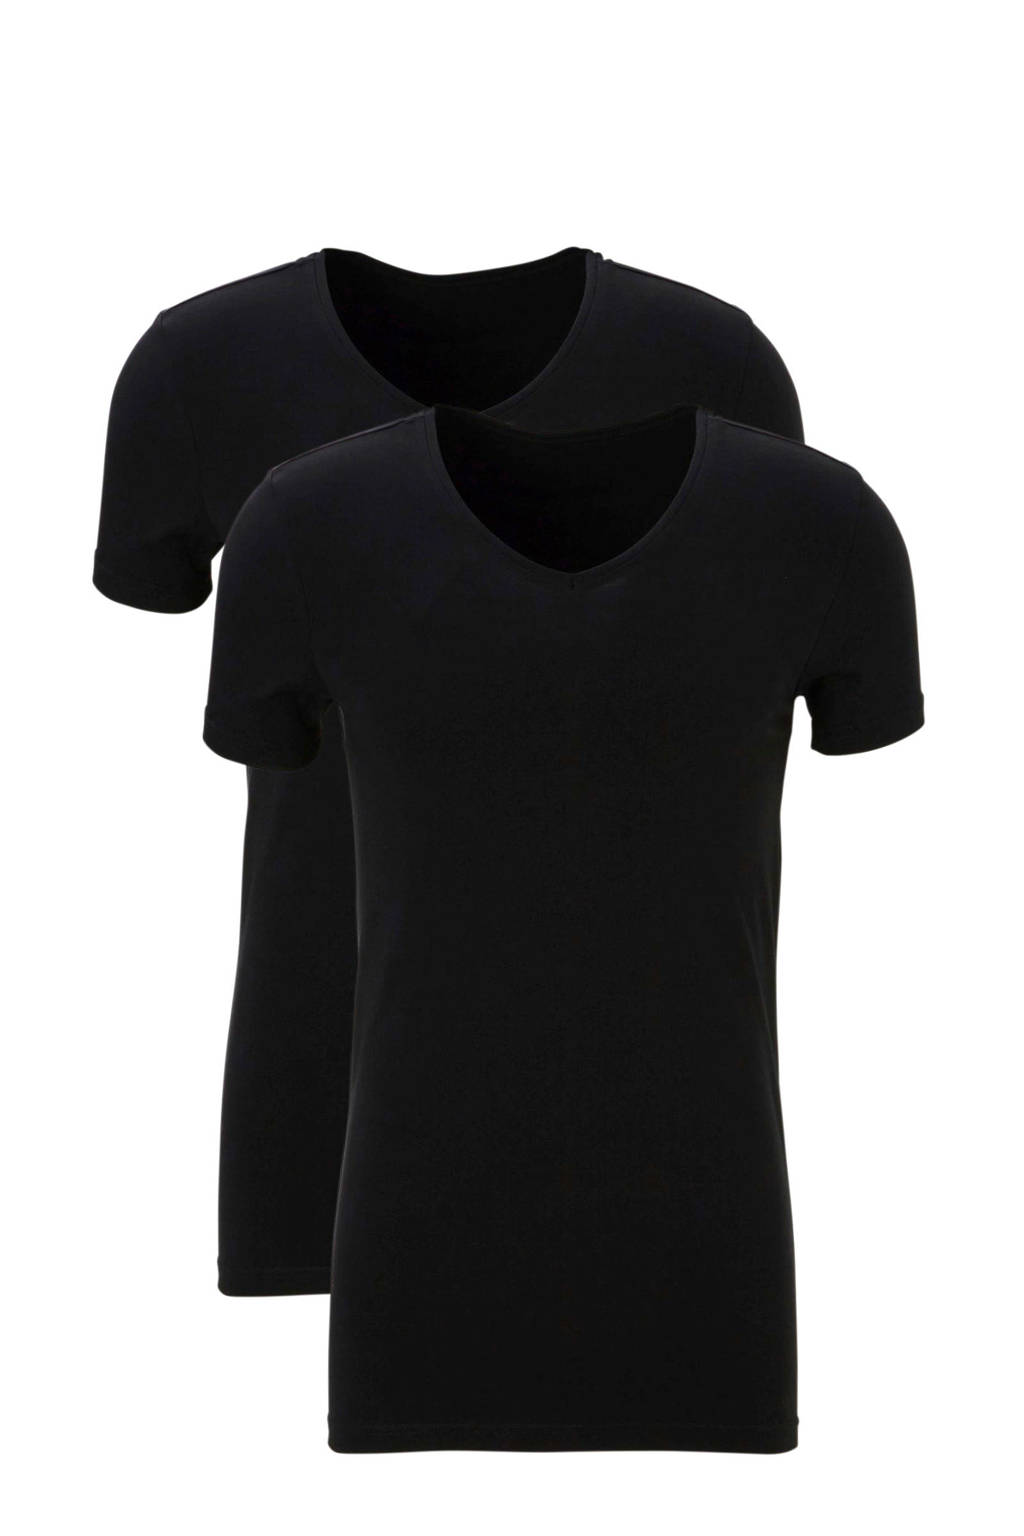 ten Cate slimfit T-shirt (set van 2) zwart, Zwart